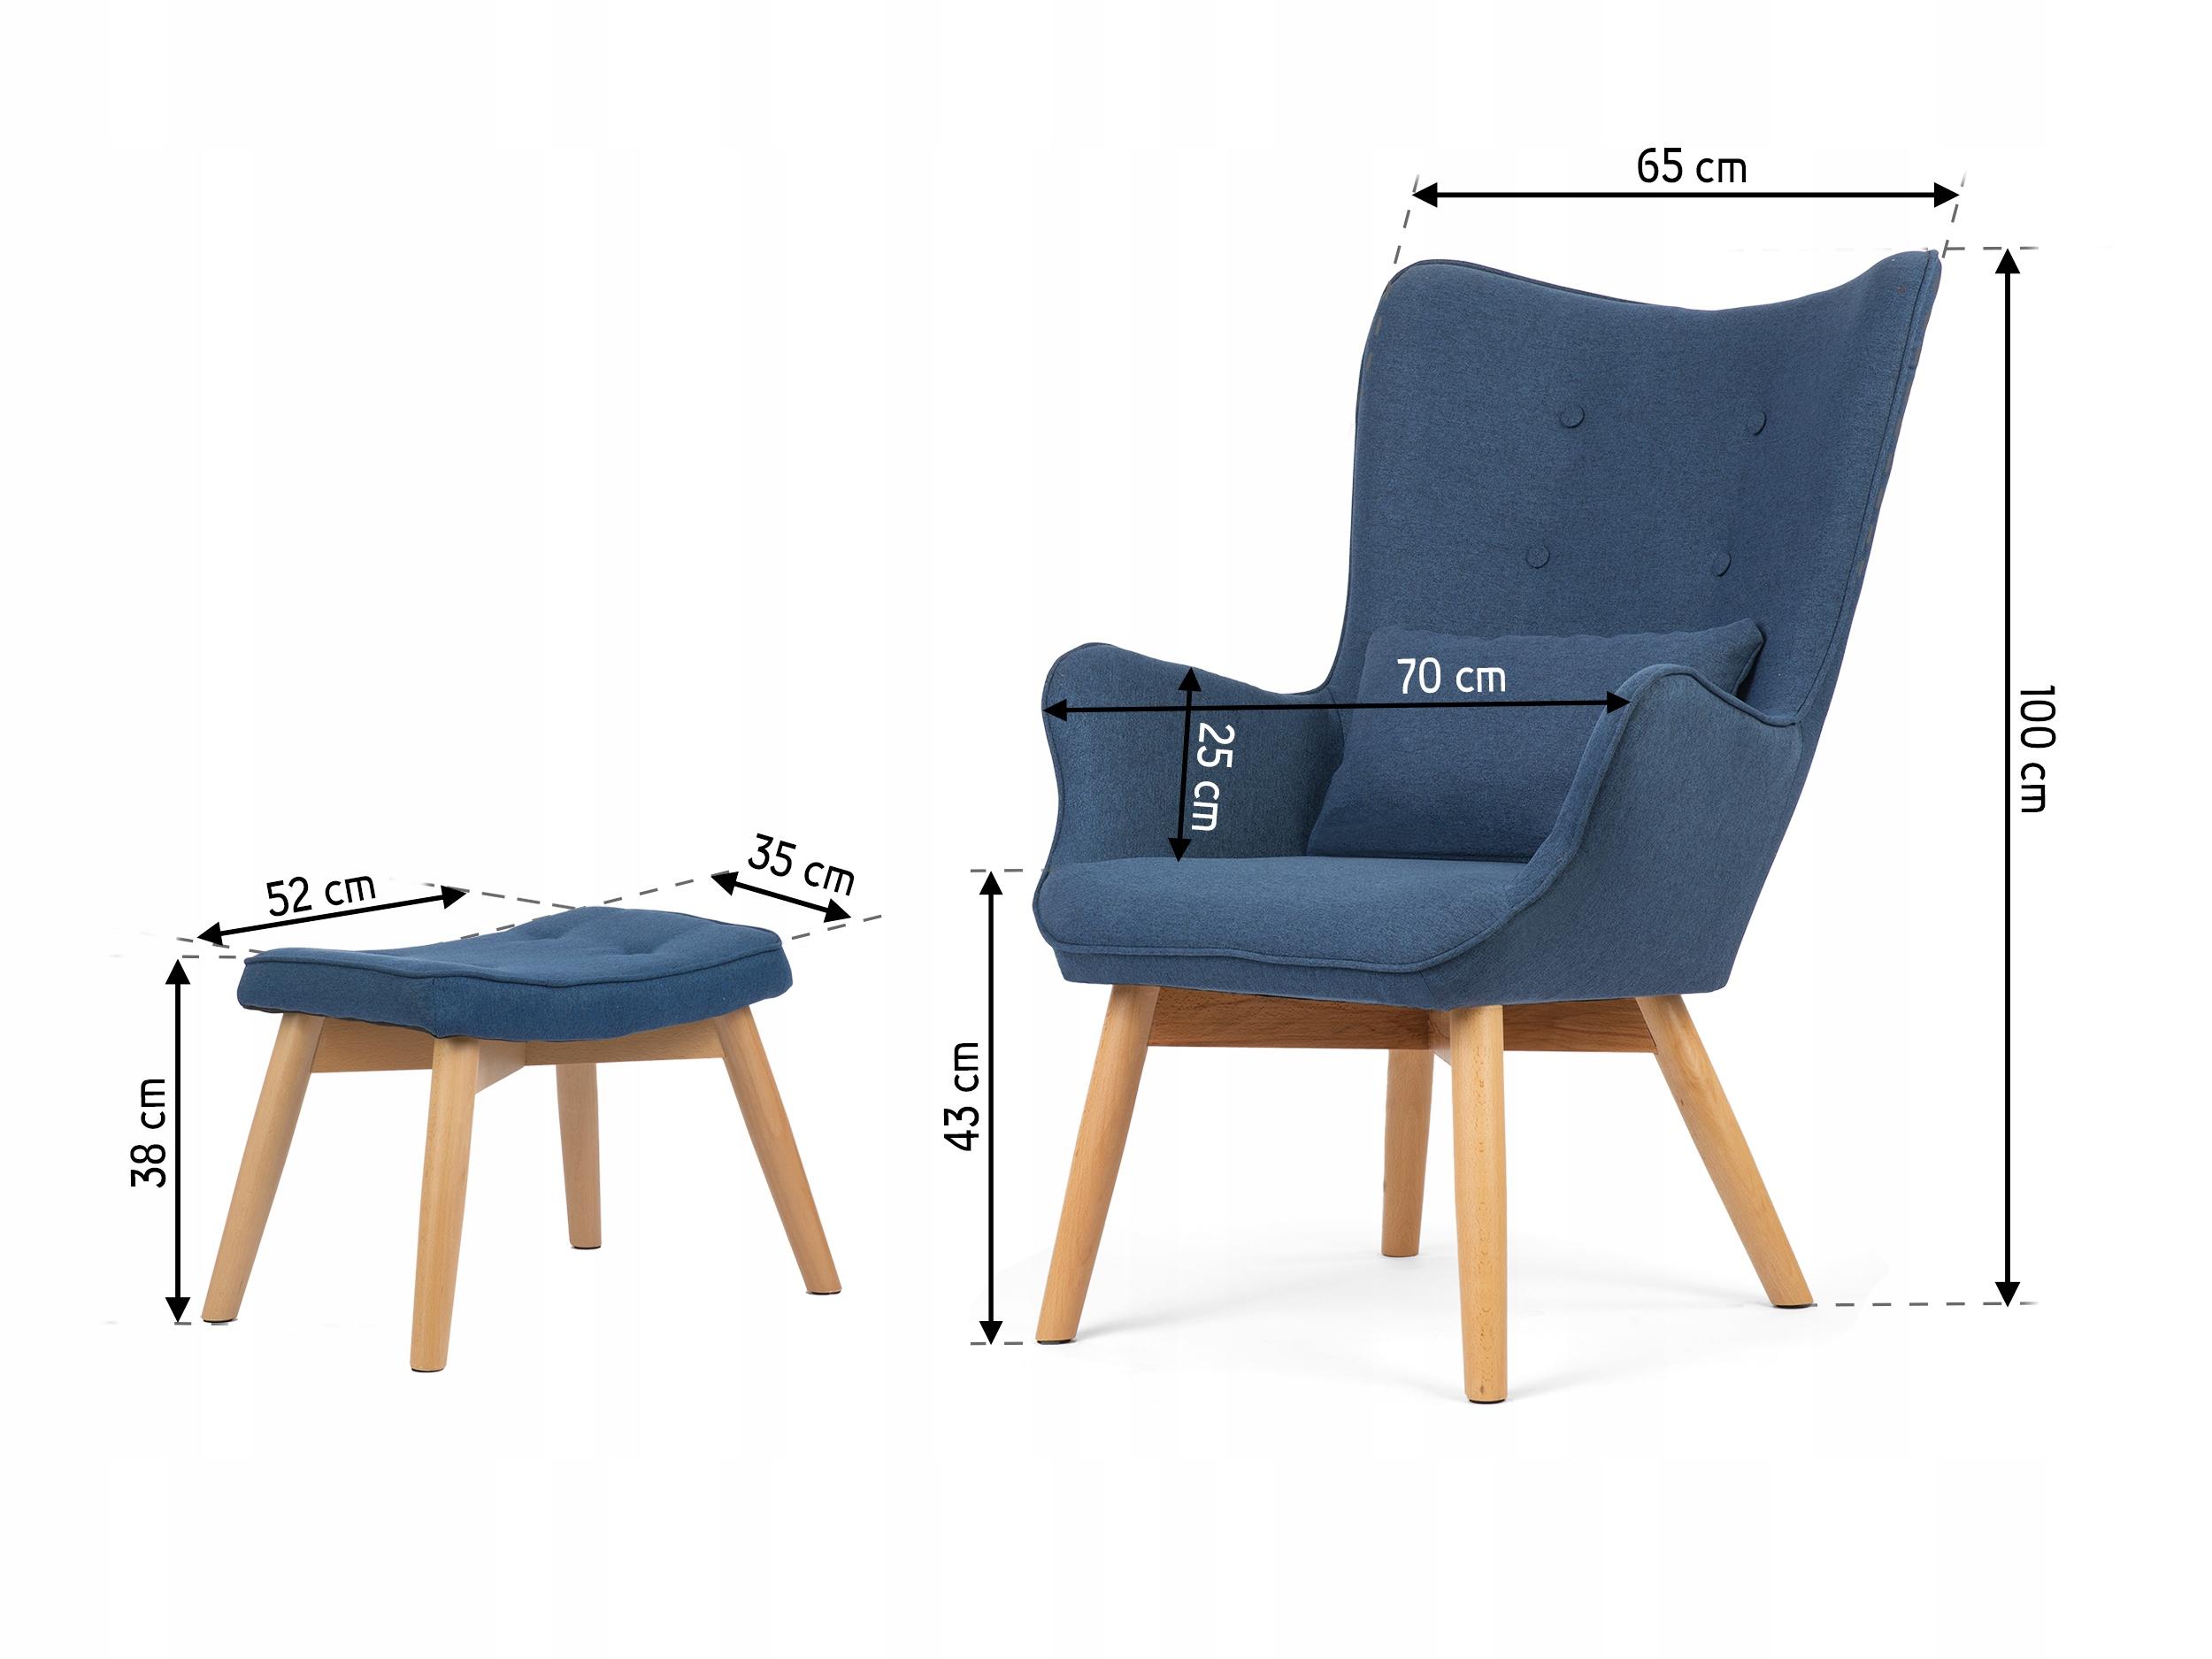 Fotel USZAK styl skandynawski + podnóżek poduszka Marka Sofotel